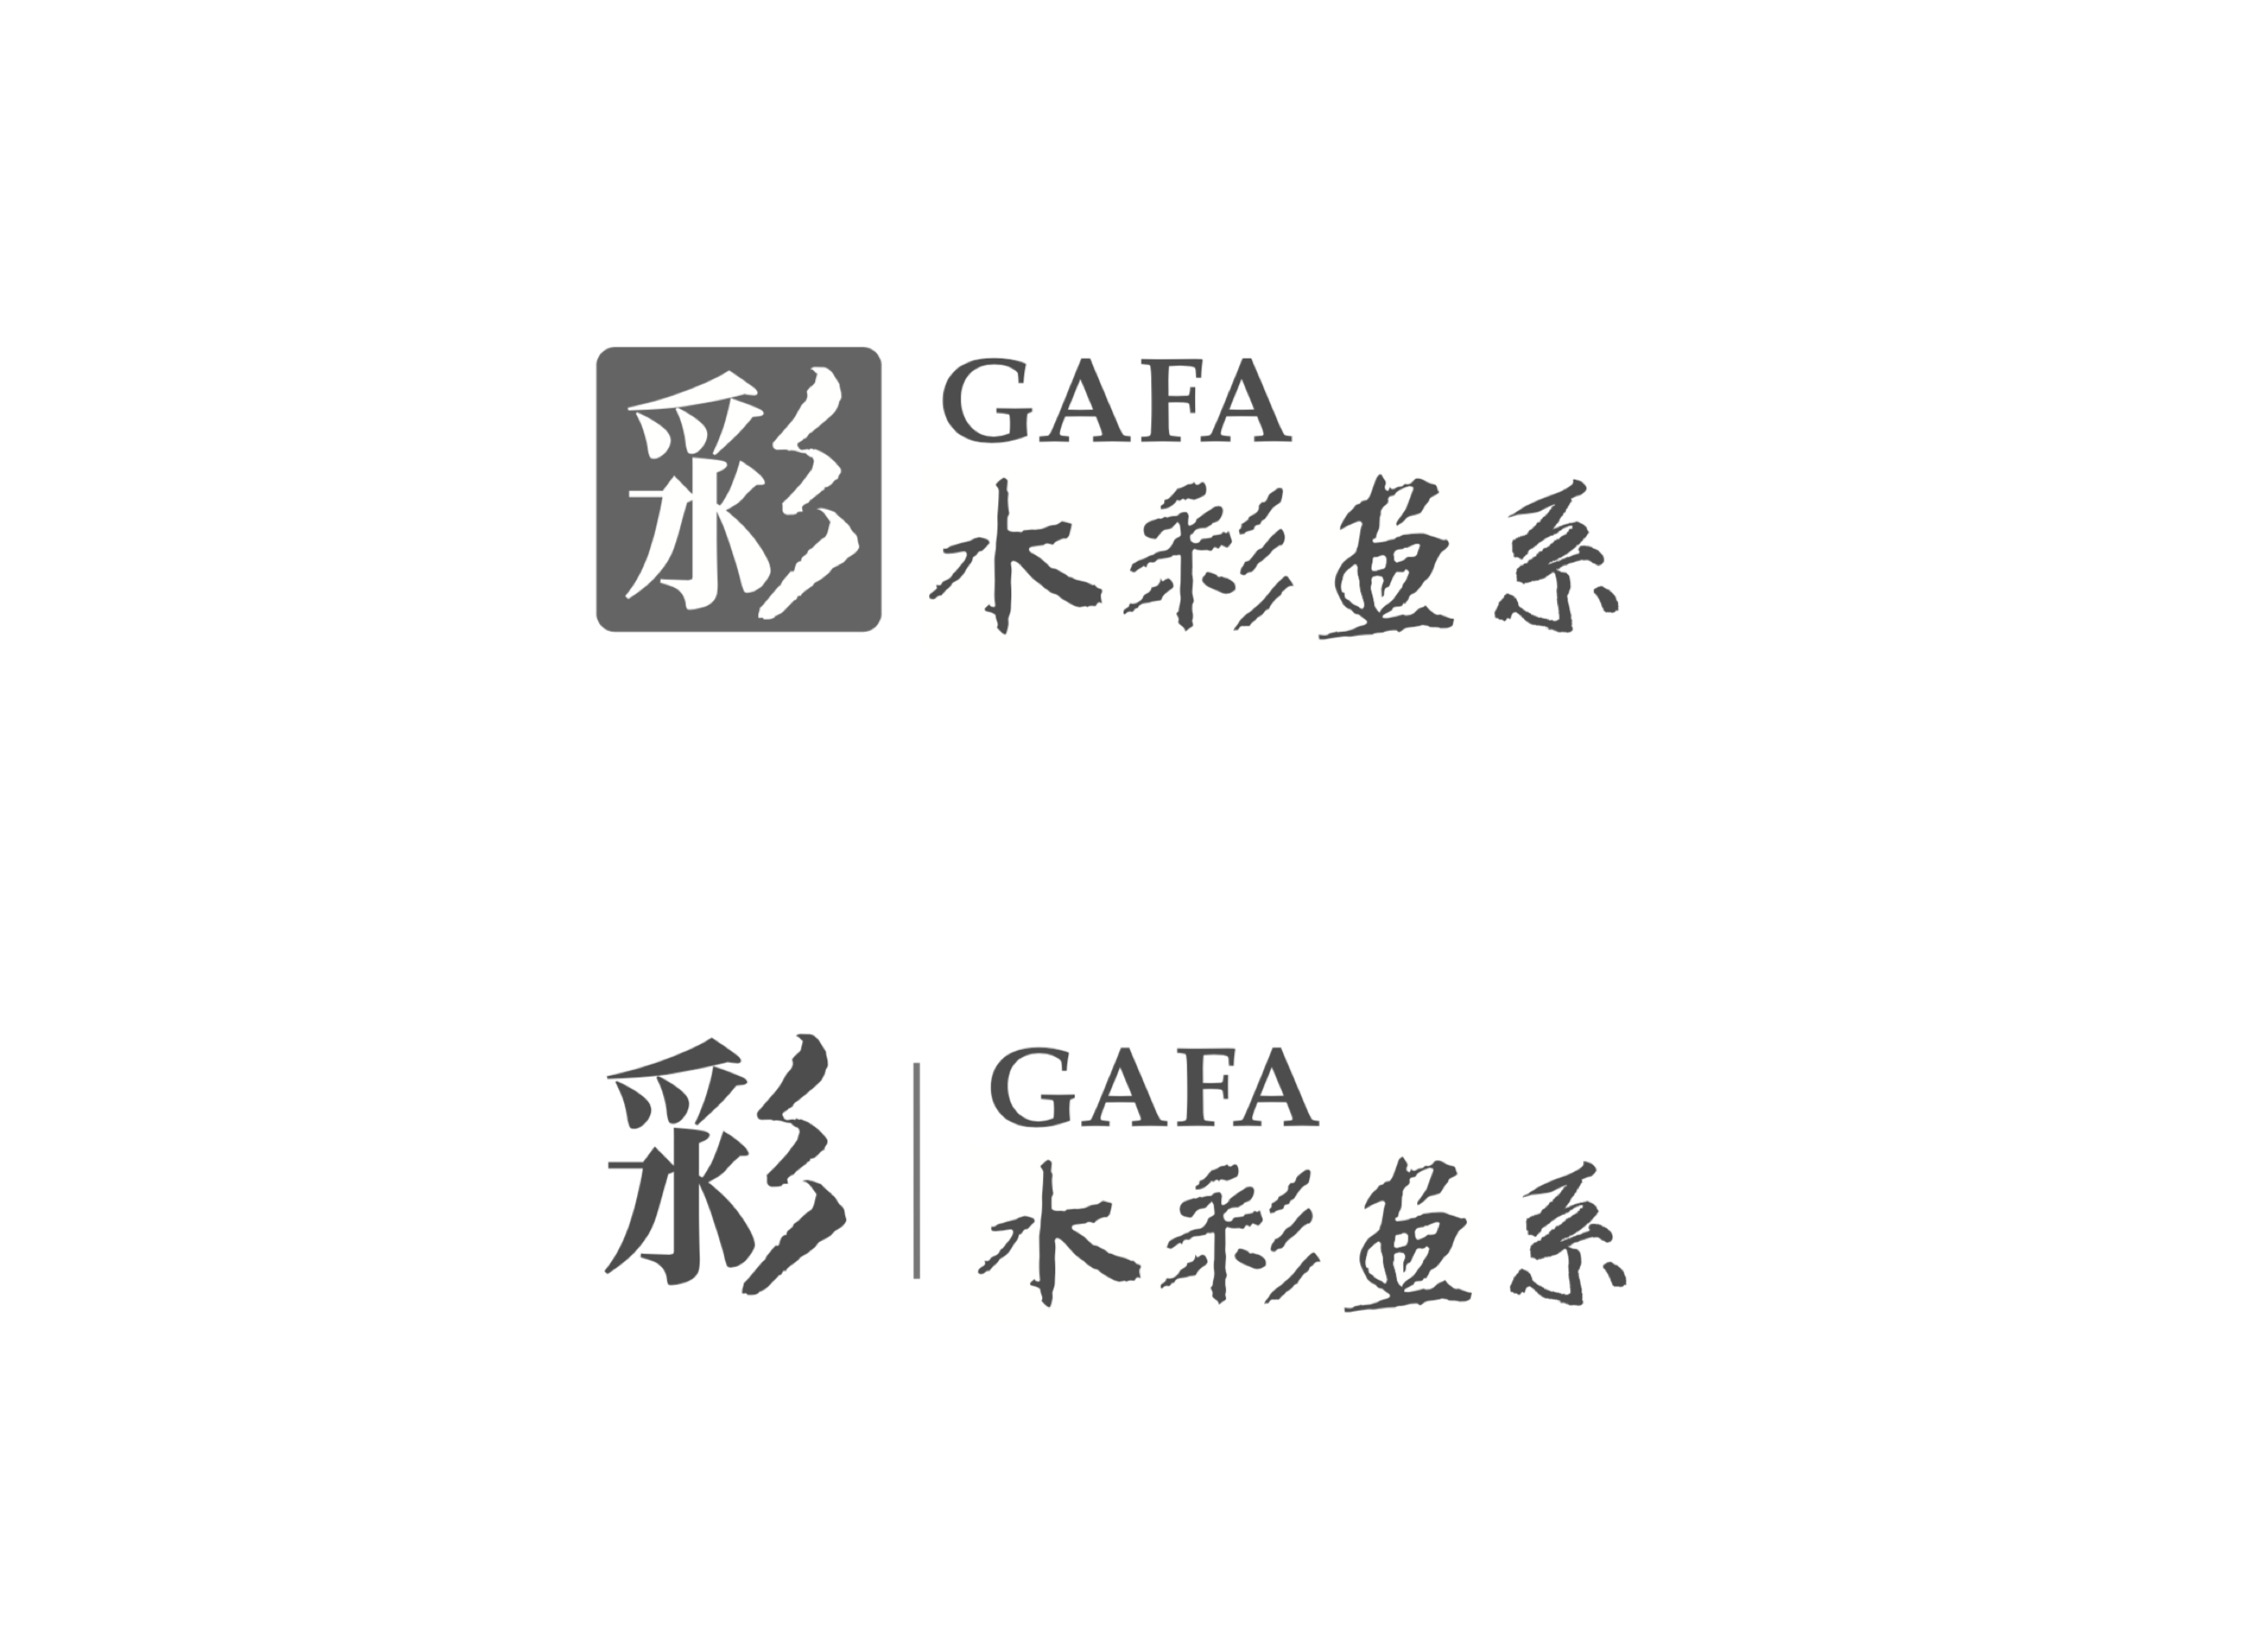 https://ft-bk1.oss-cn-zhangjiakou.aliyuncs.com/Public/Uploads/img/n_content_20201210110110_5562.png